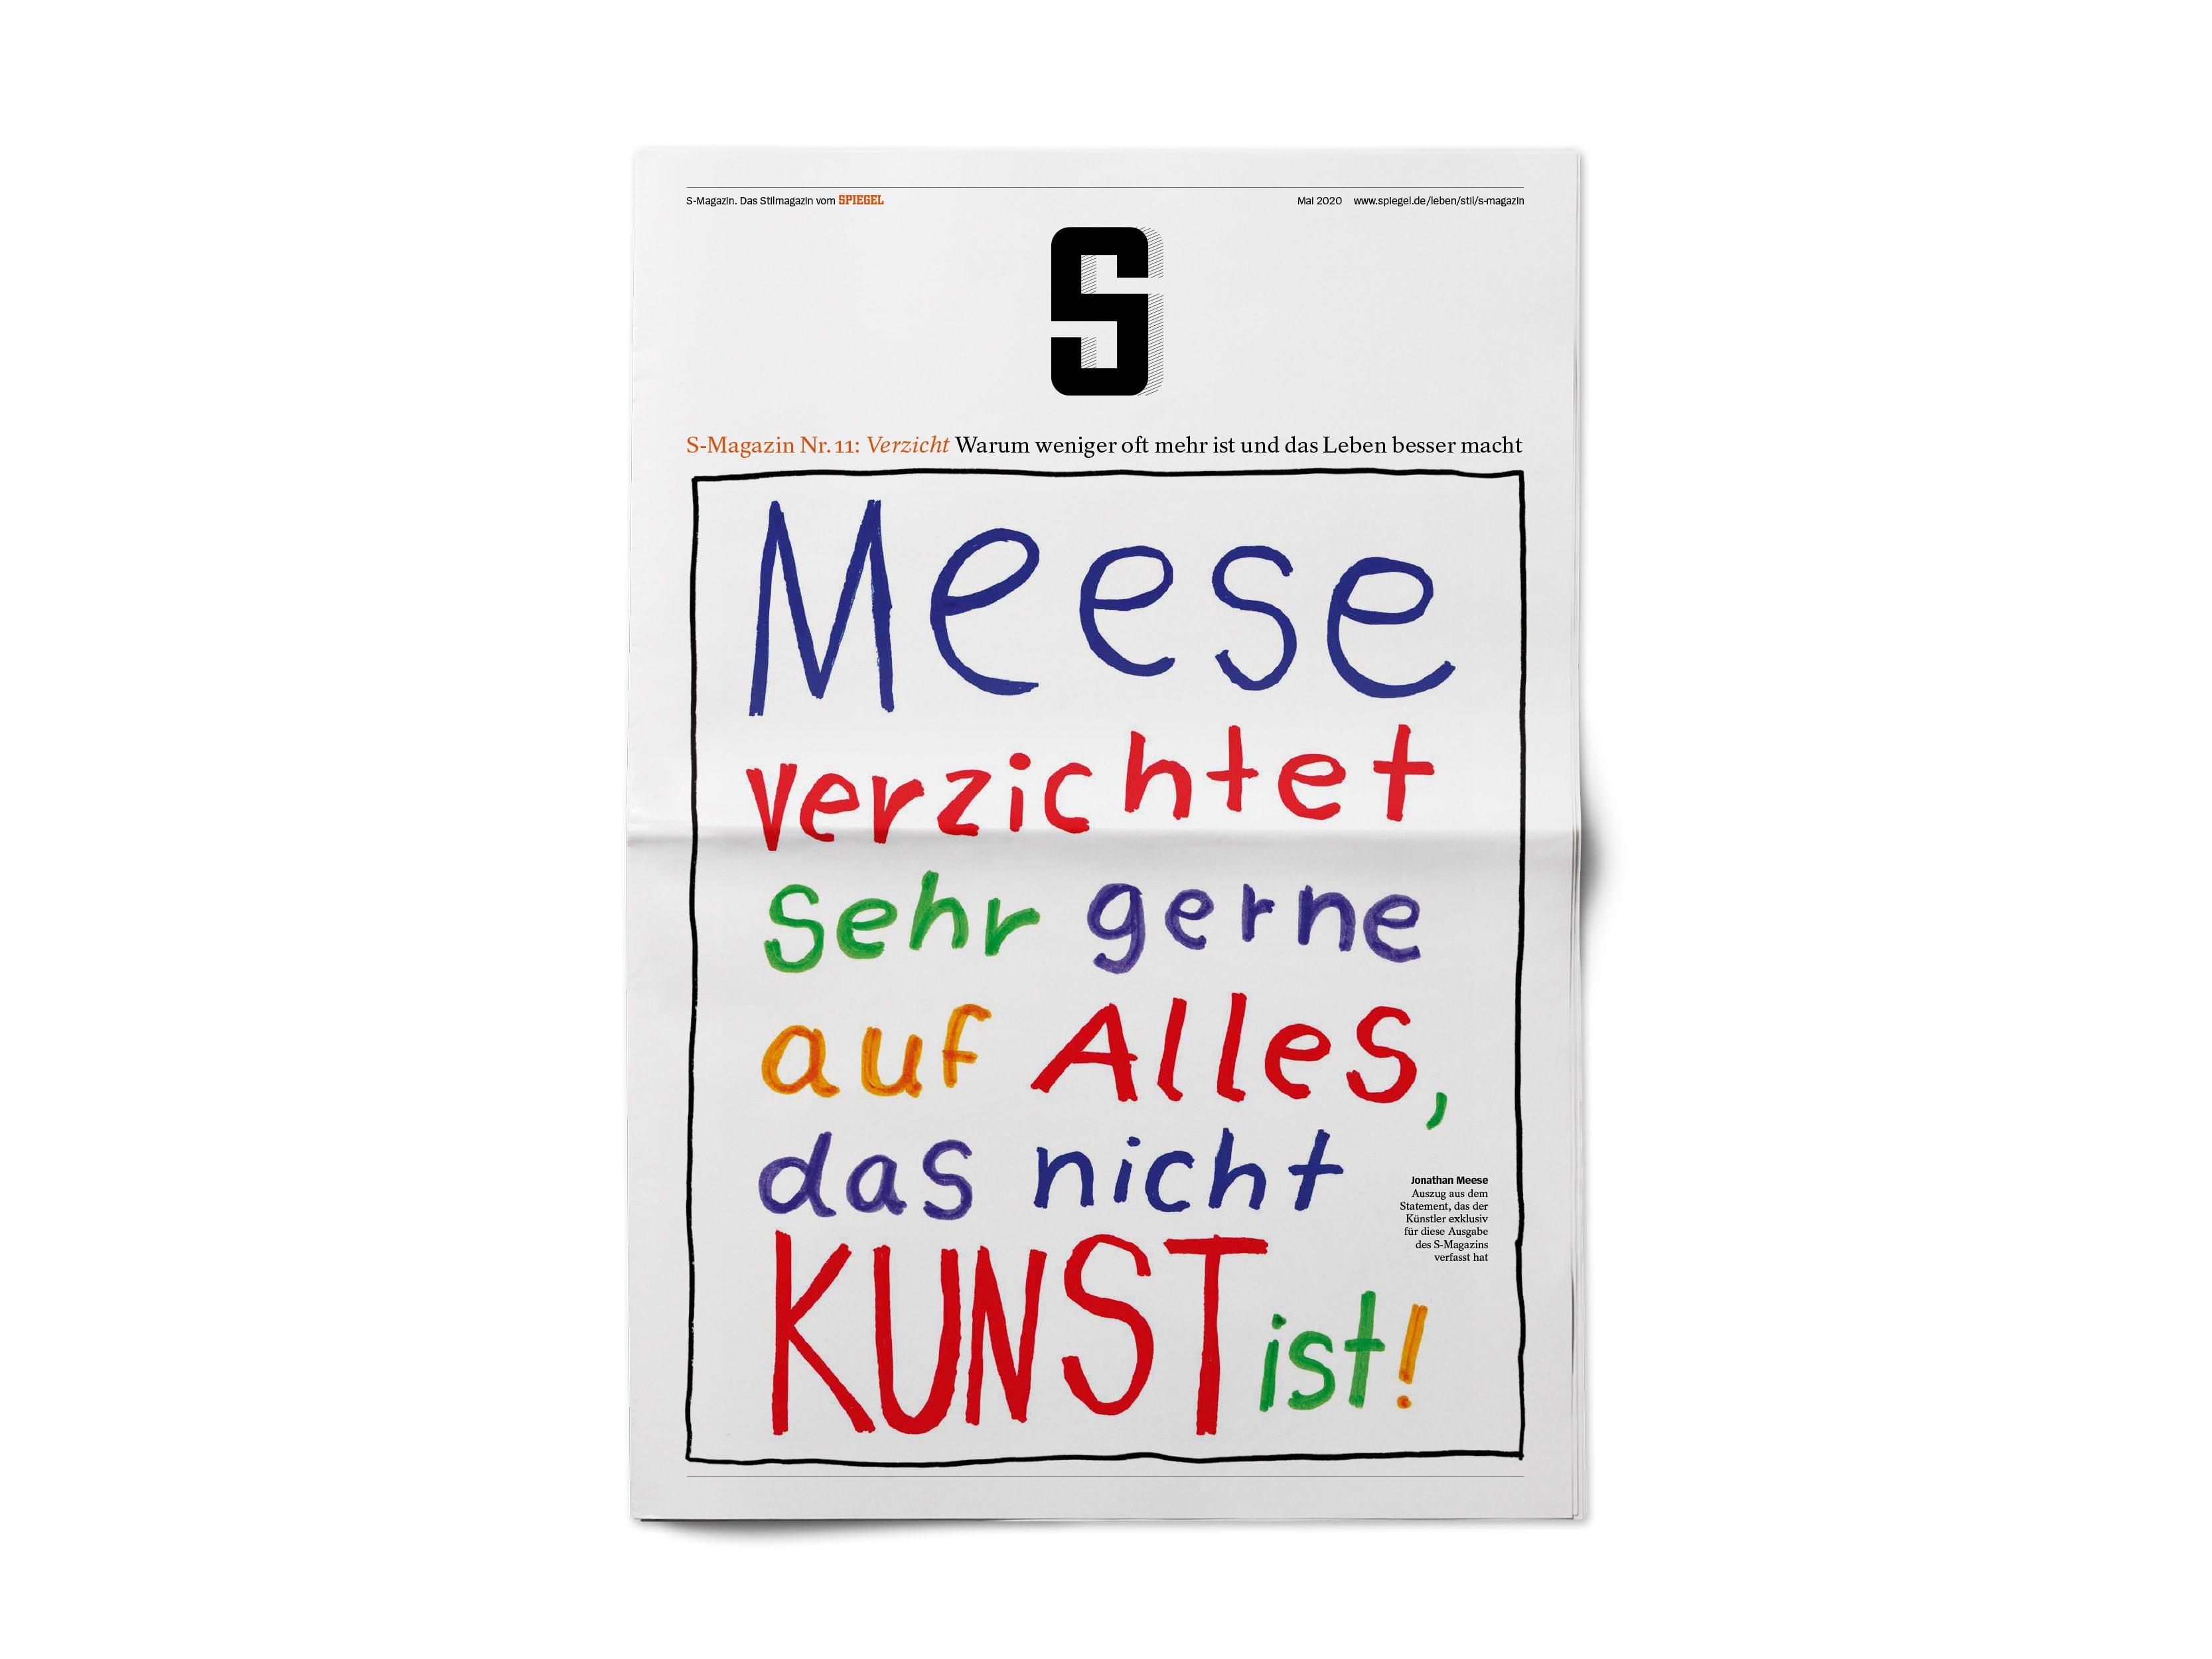 Bureau Johannes Erler – S Nr. 11 ist da!